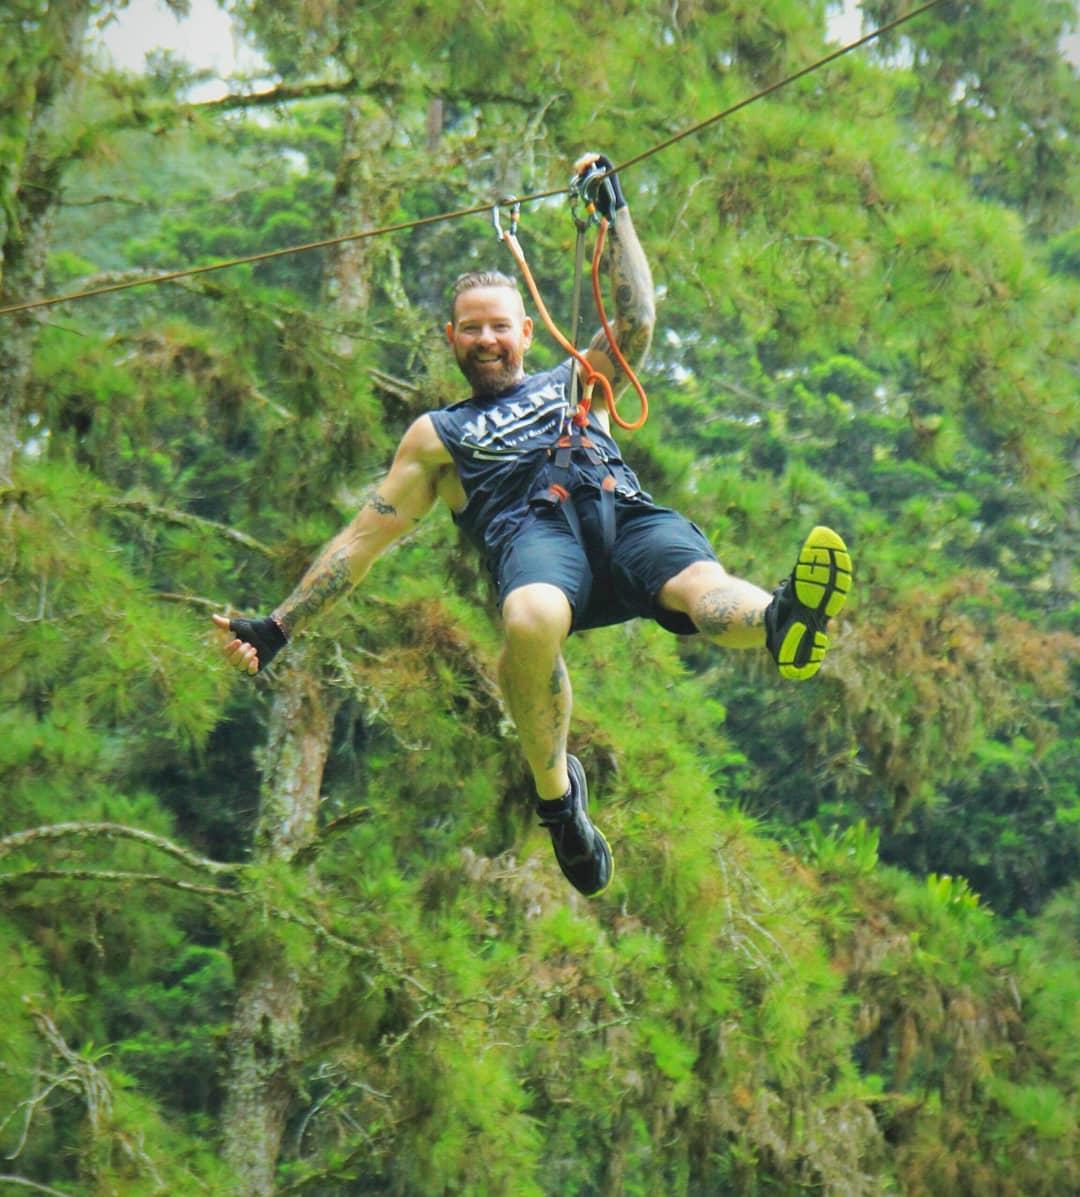 Bali Treetop Adventure Park - IG @novakbrennan